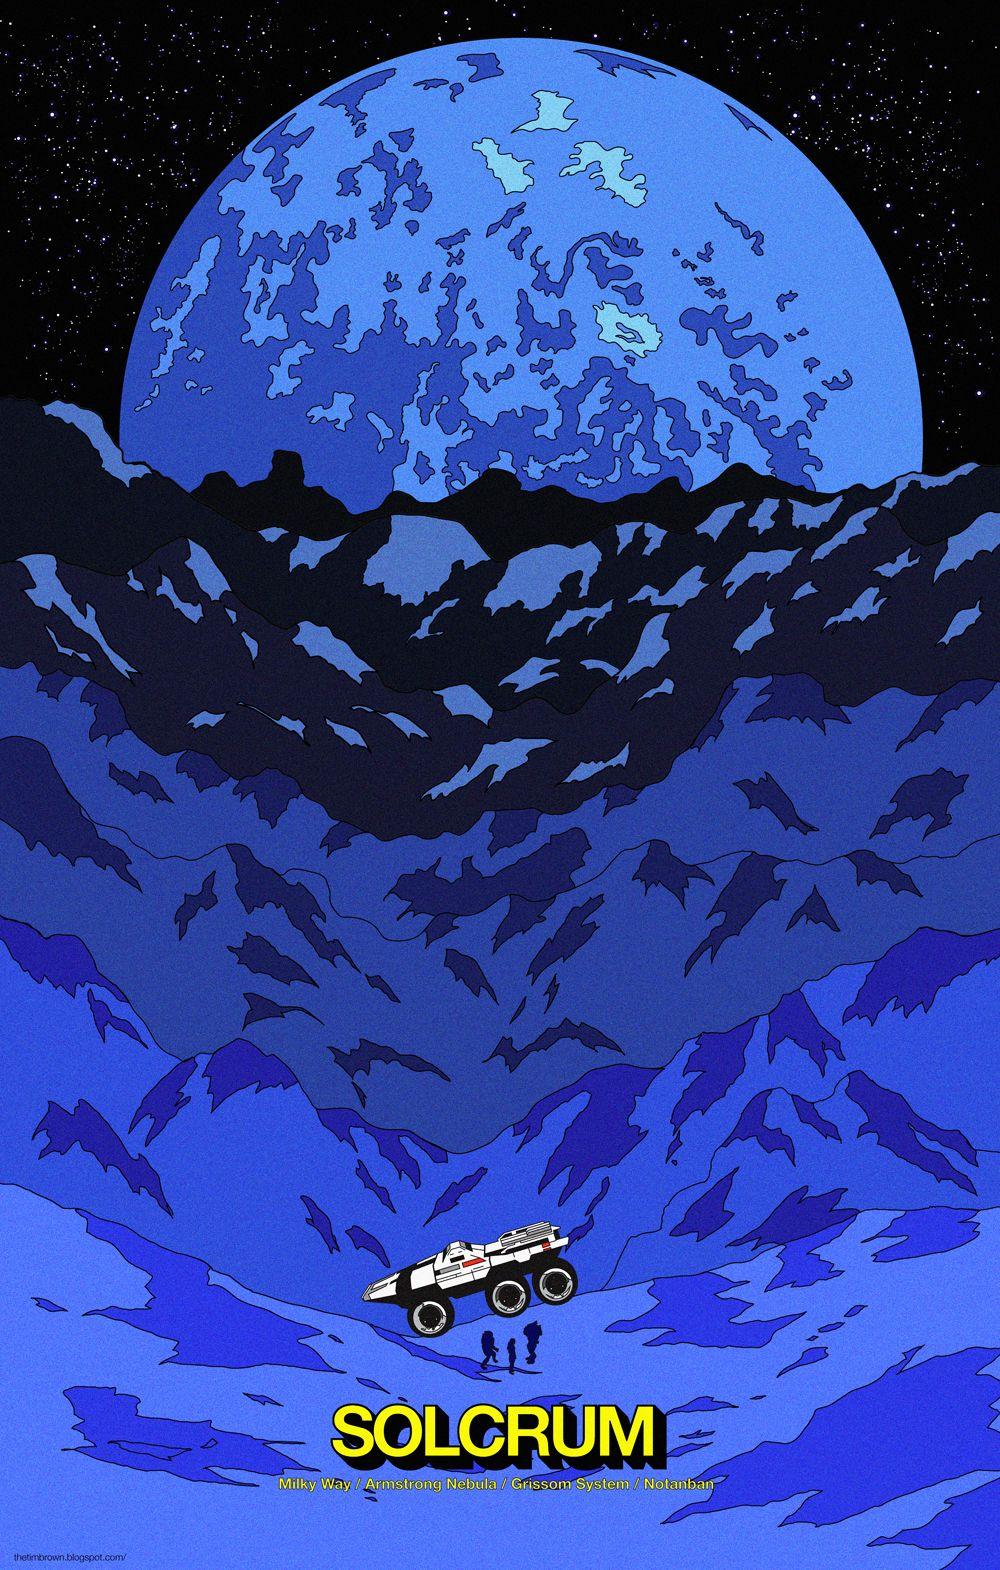 Tim Brown - Mass Effect Illustration